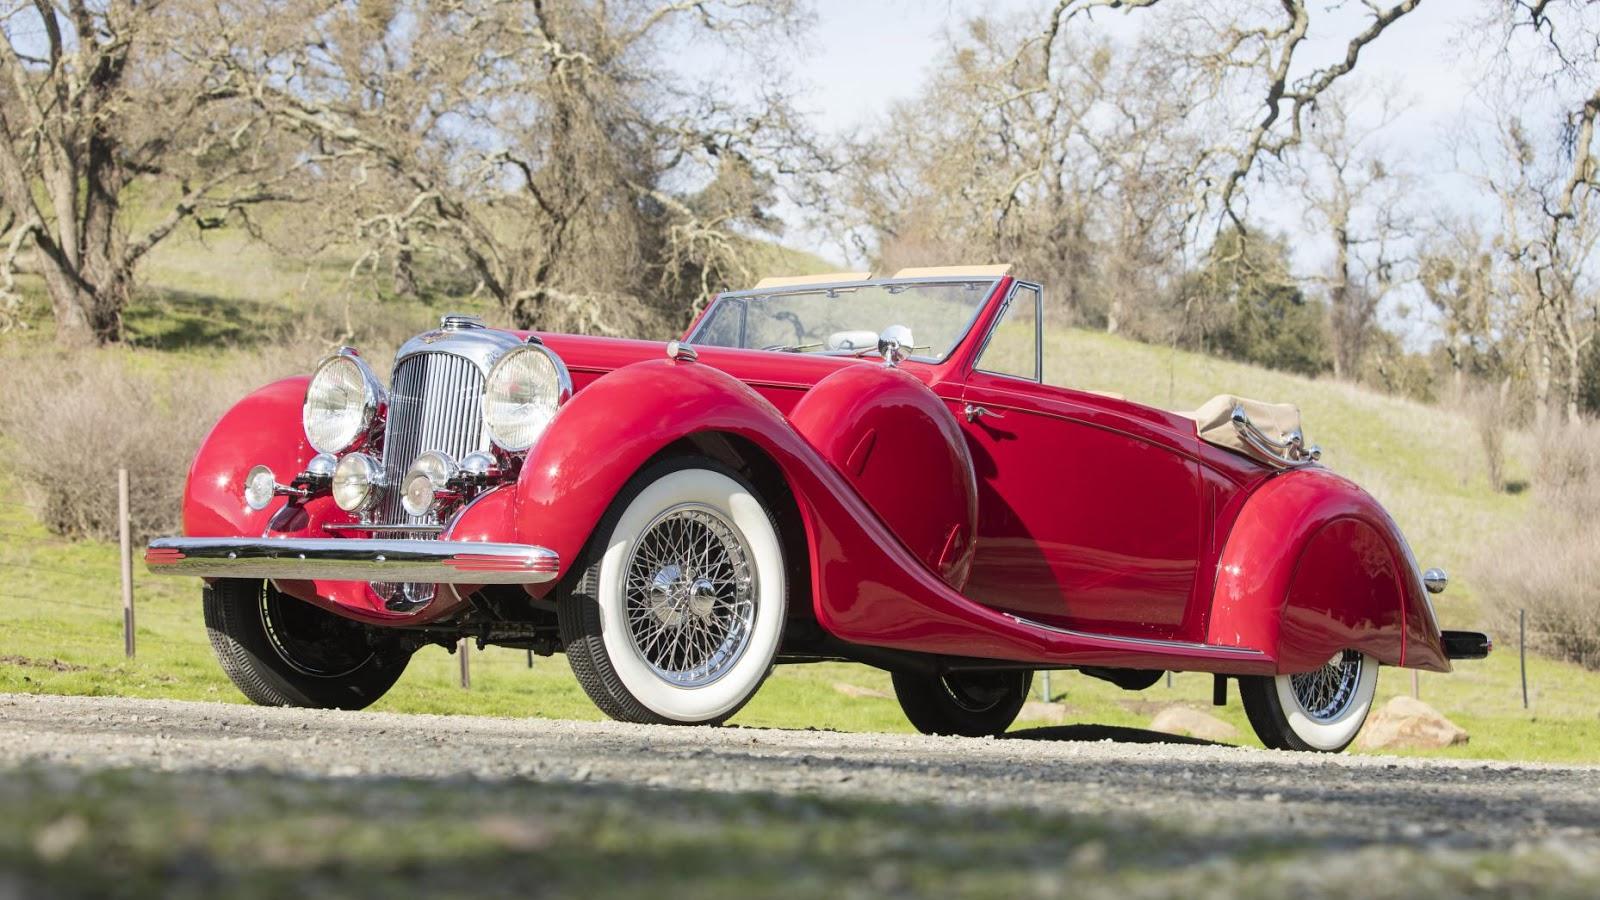 1939 Lagonda V12 Drophead Coupe: $458,700